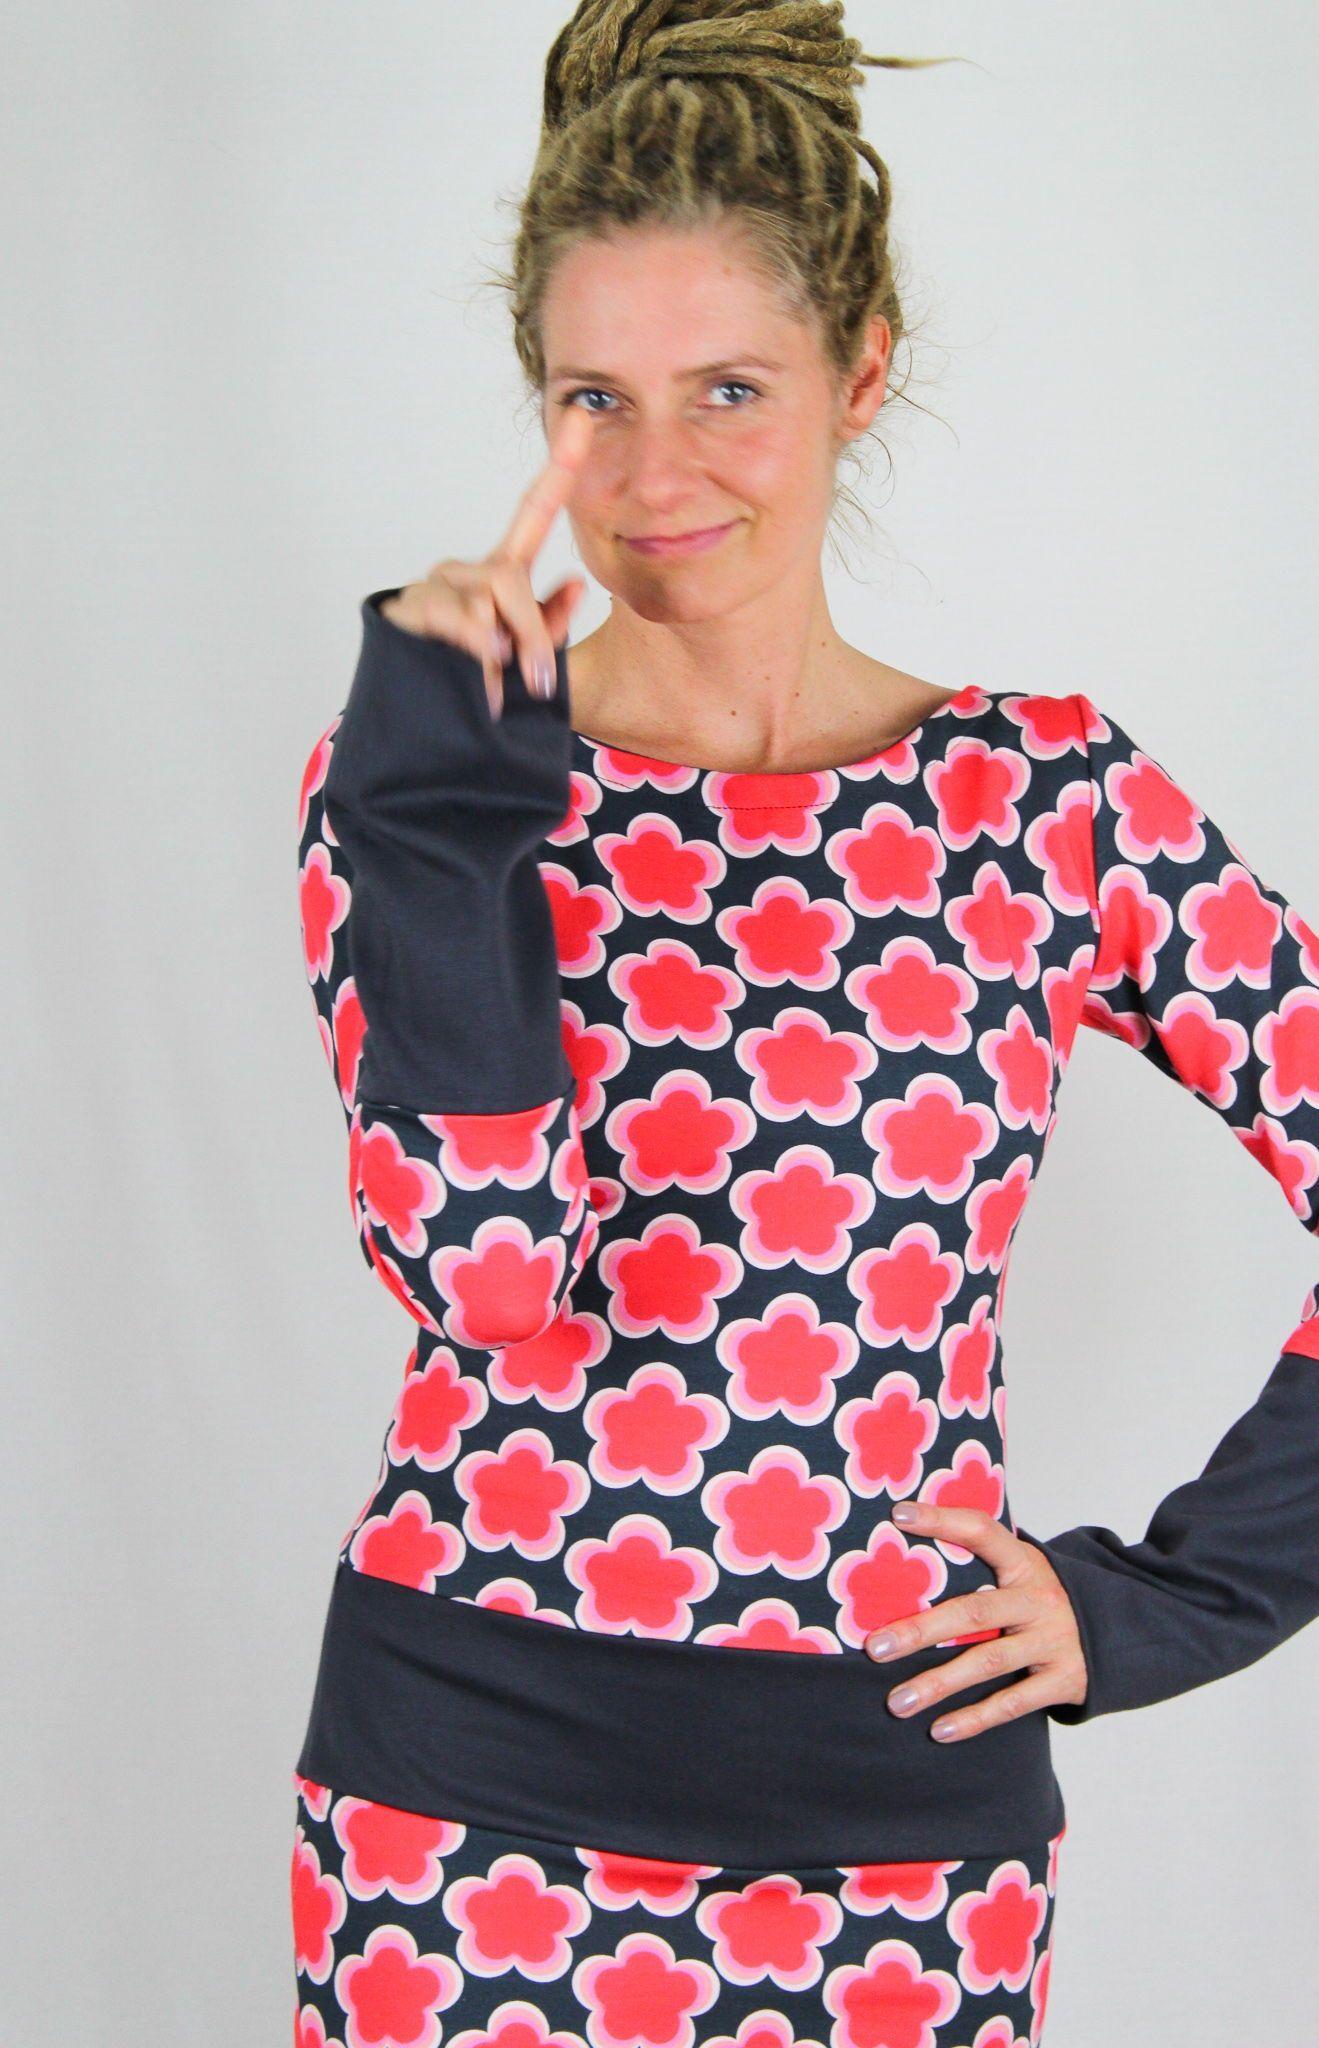 Retro Kleid, Herbst Outfit, Kleid nähen, Kleid Schnittmuster, ADELE the dress 2…